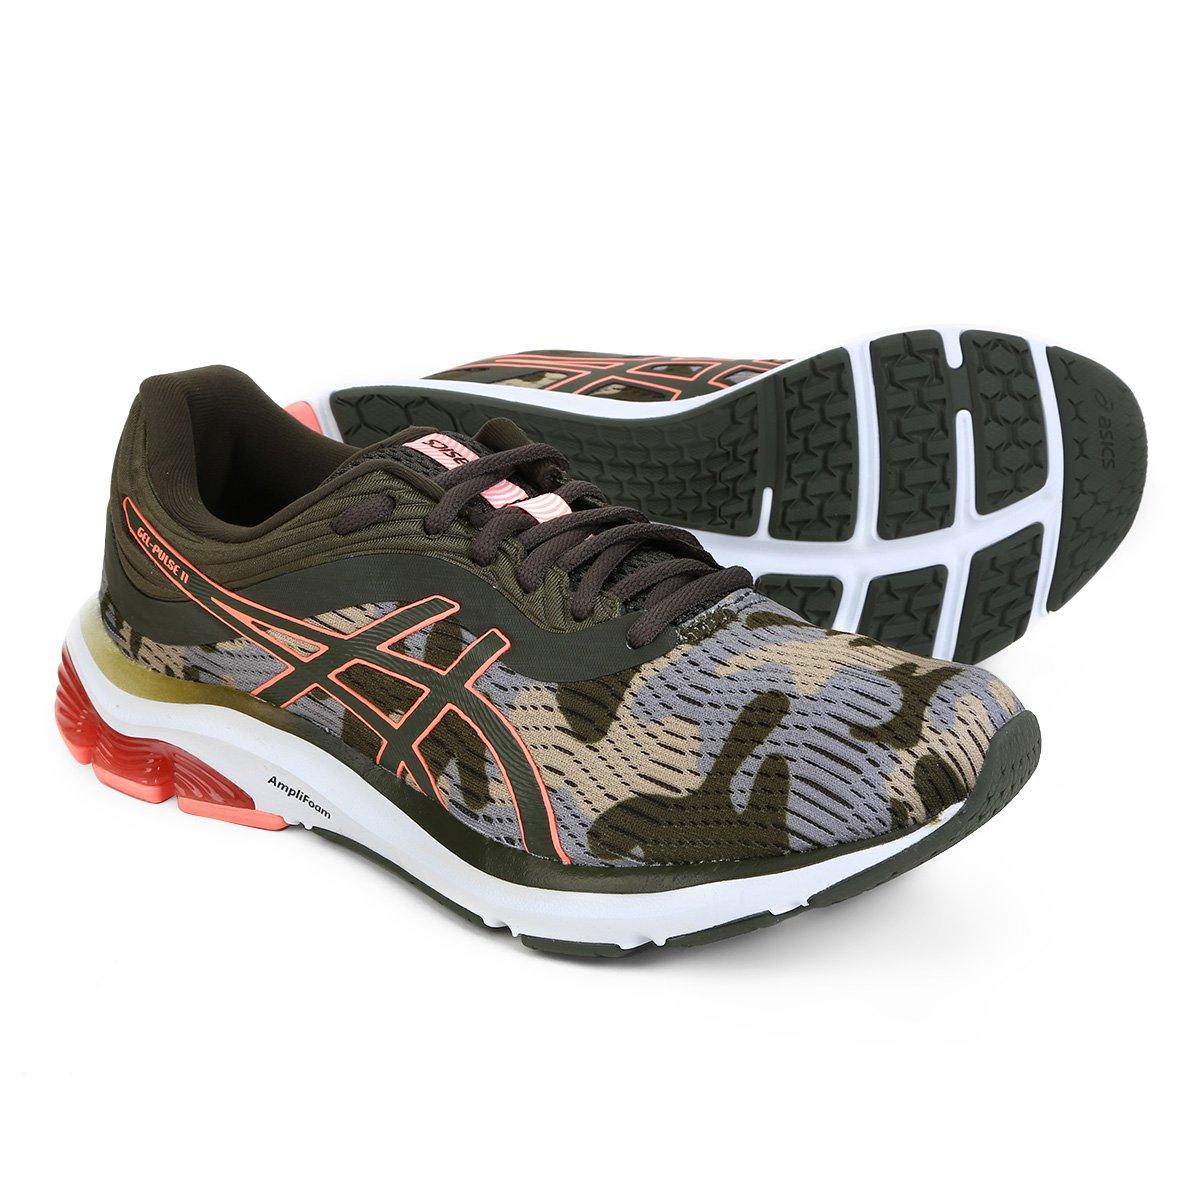 mizuno womens volleyball shoes size 8 xl juegos ki colors india